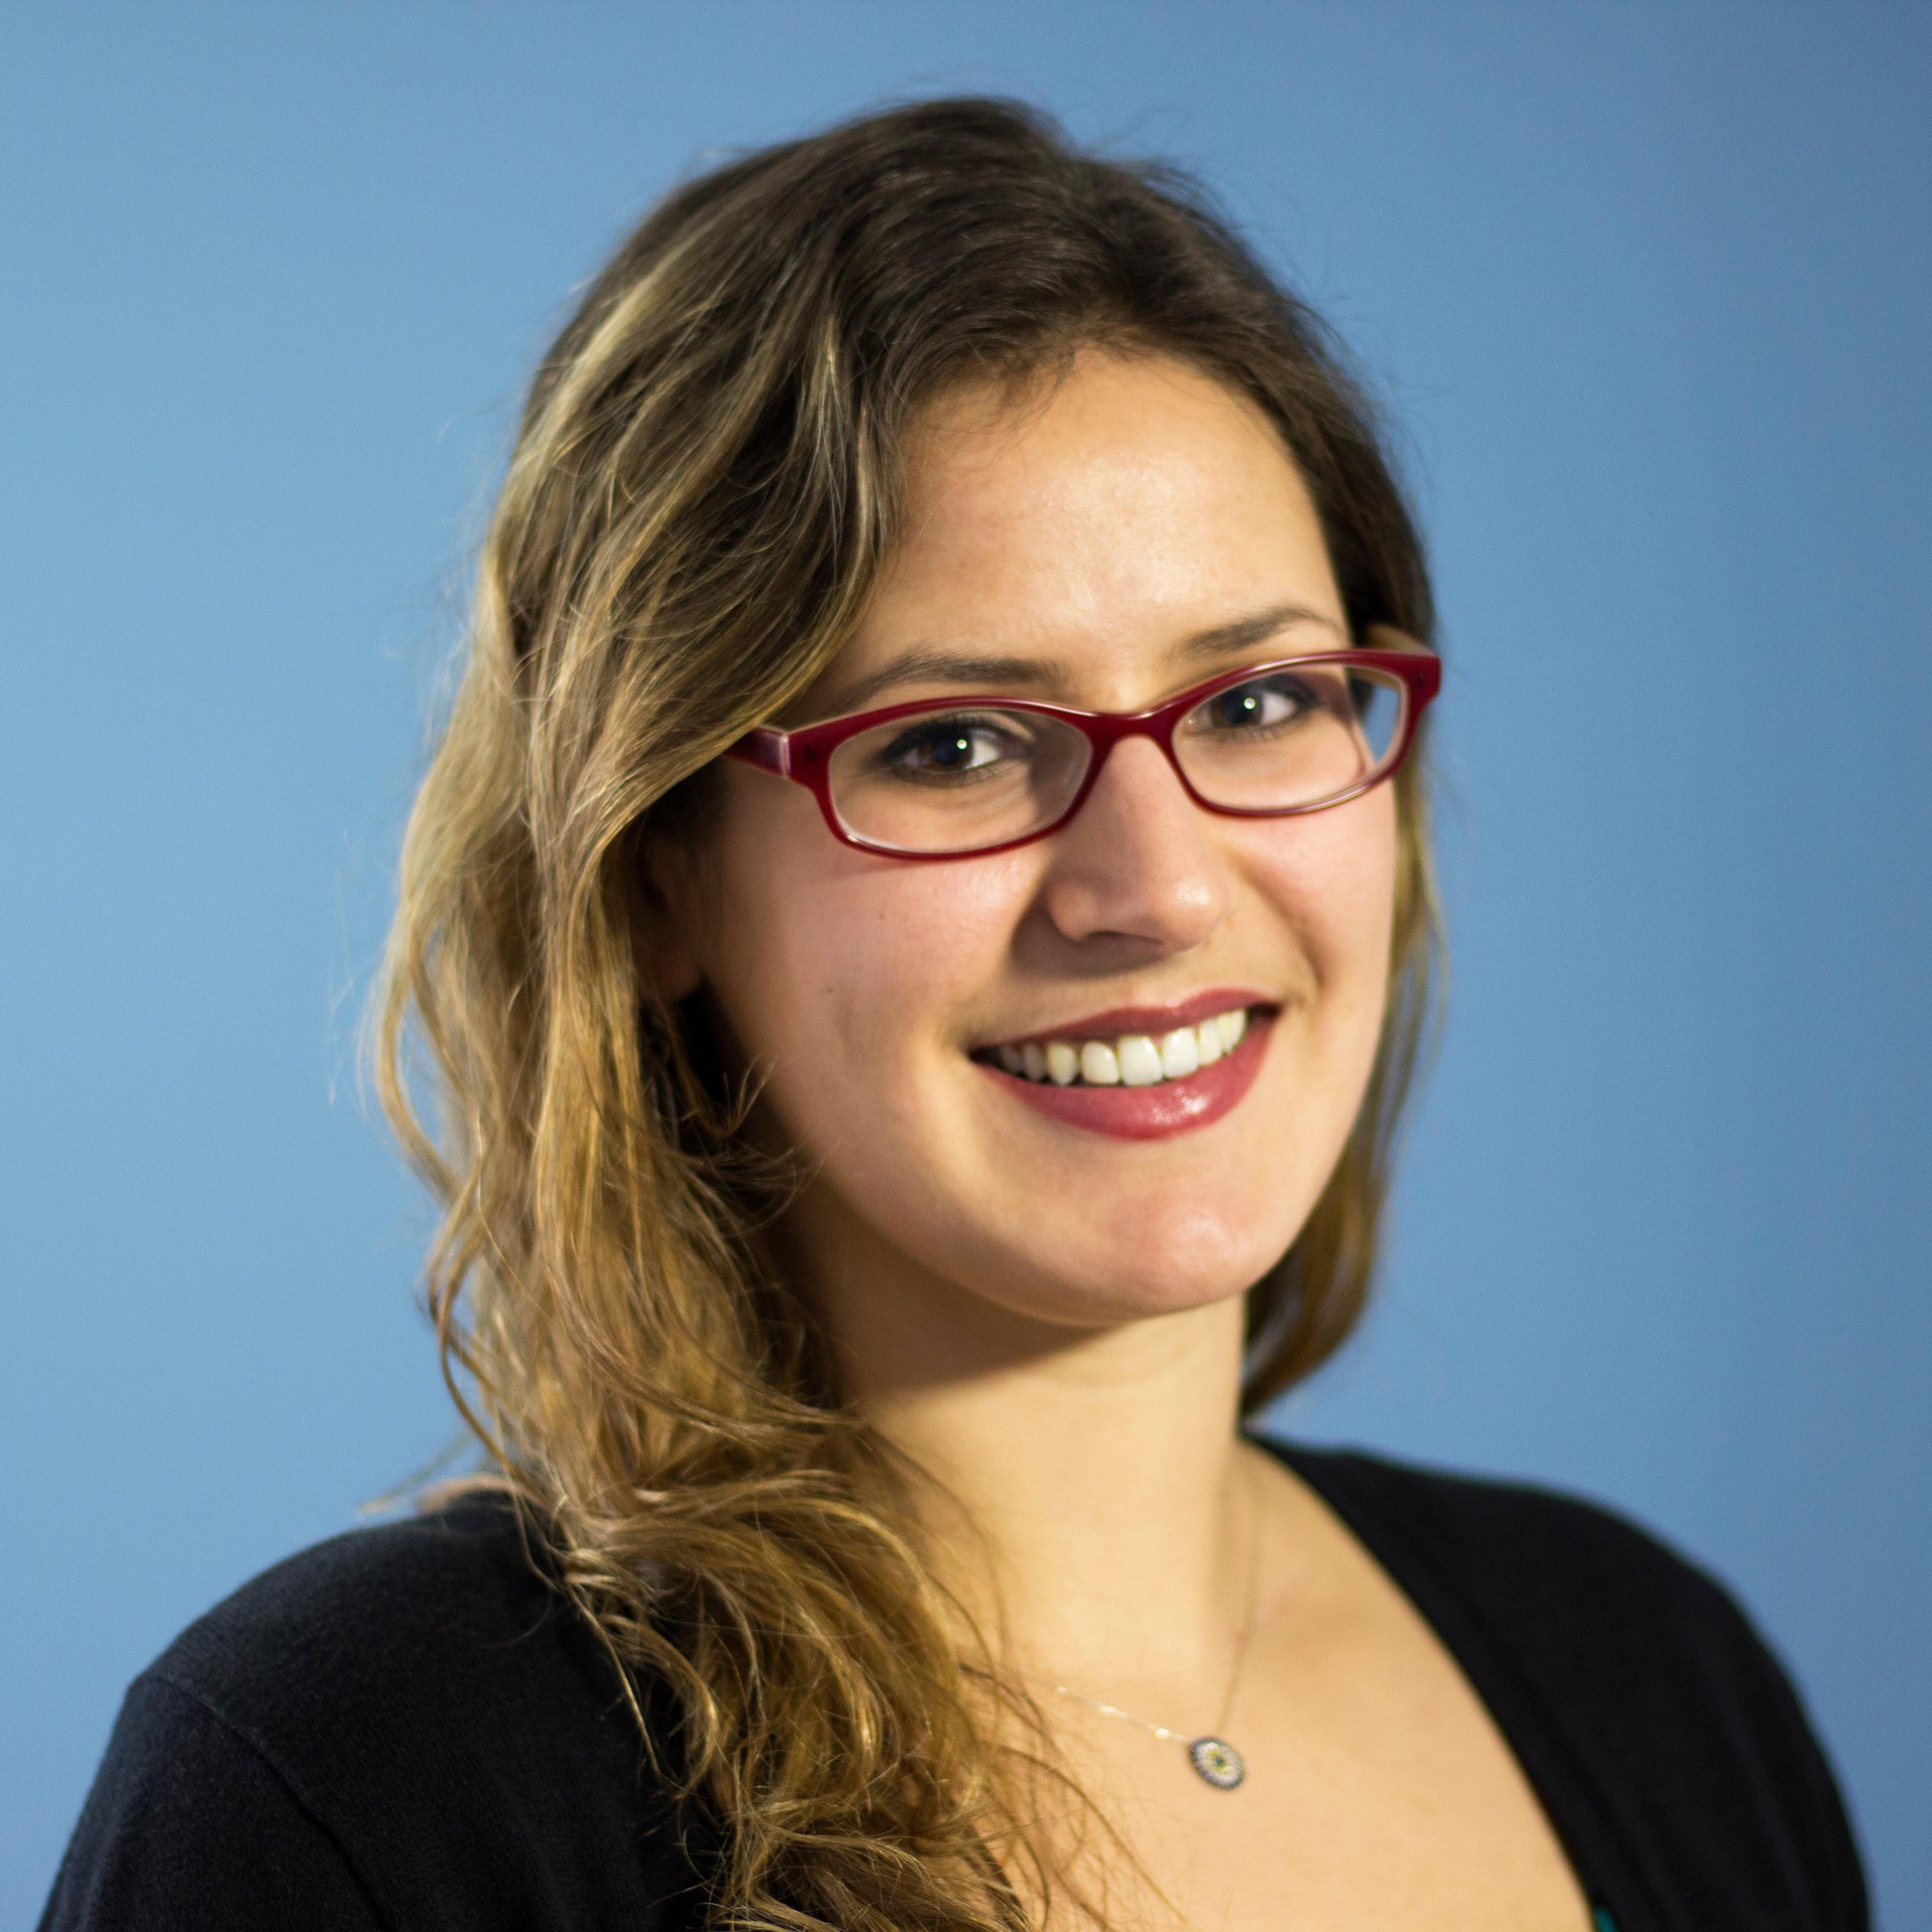 Myrka Lembo